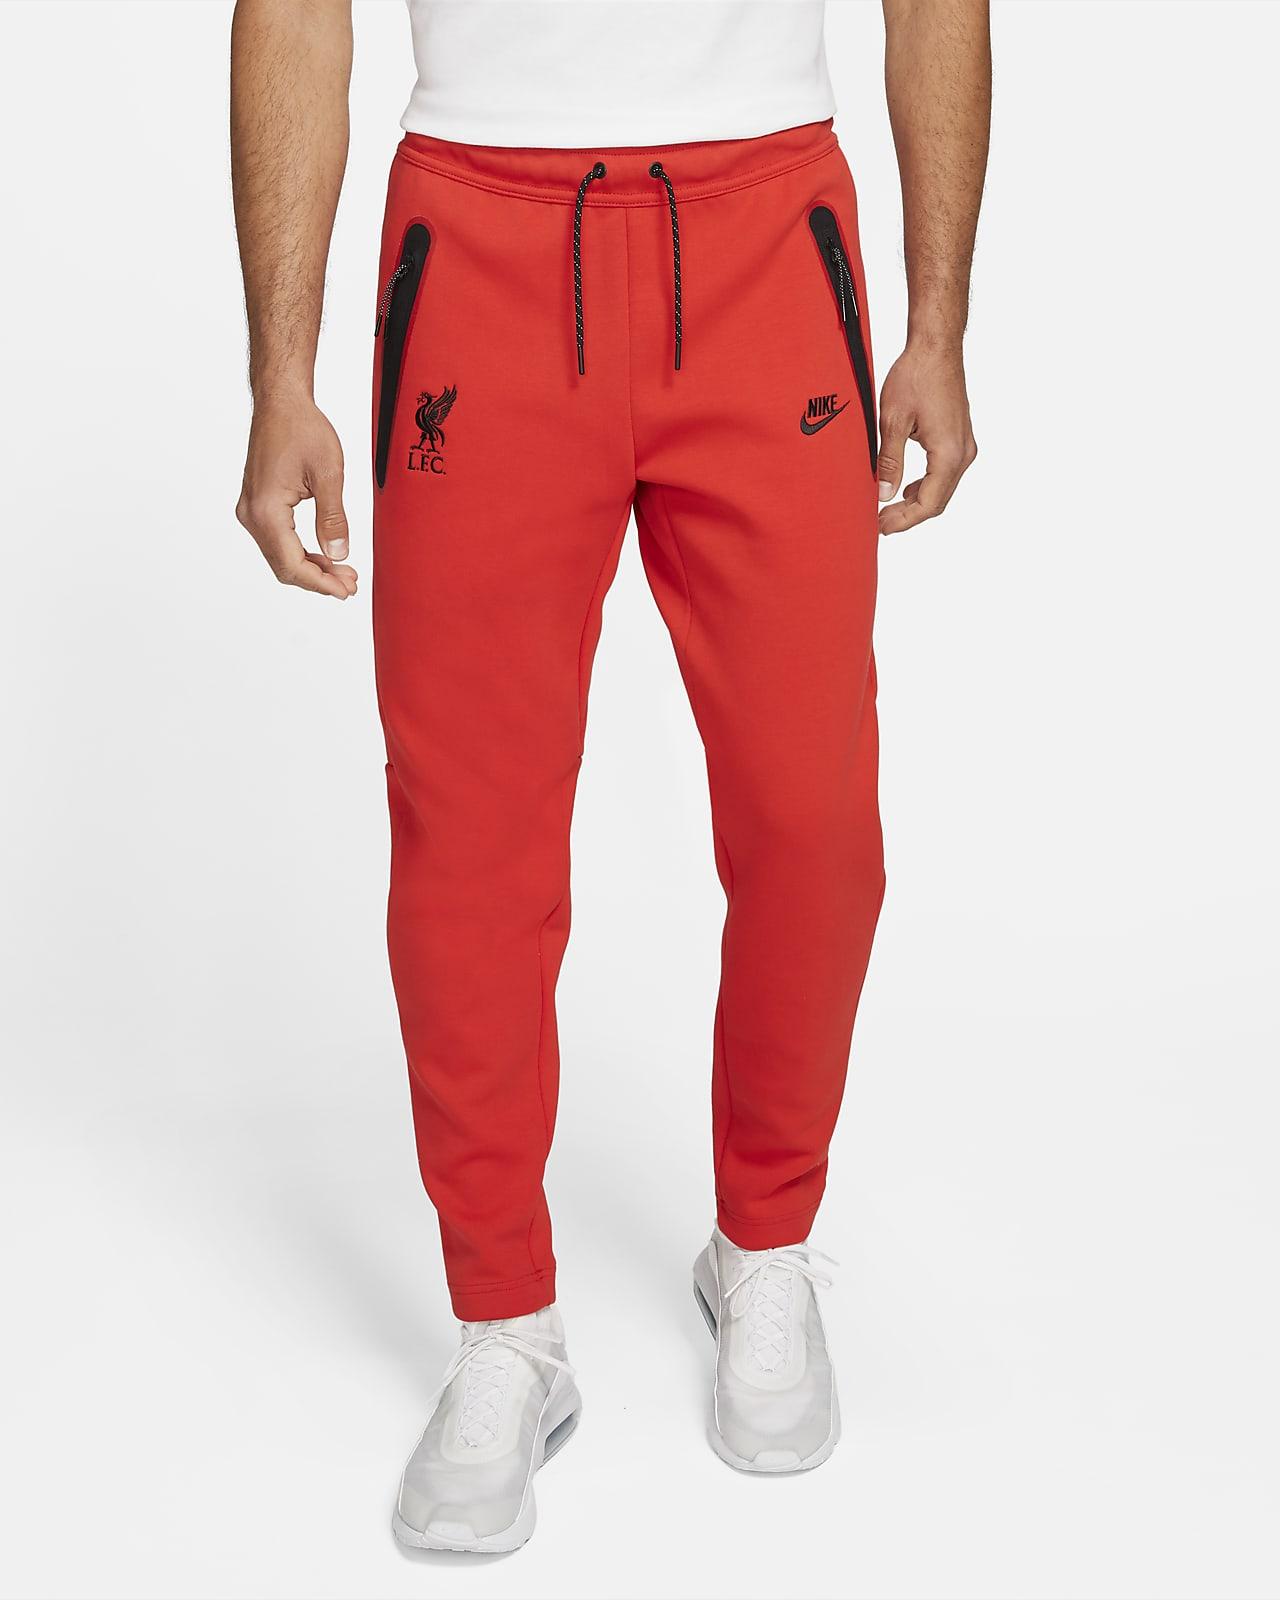 Liverpool FC Tech Fleece Men's Pants